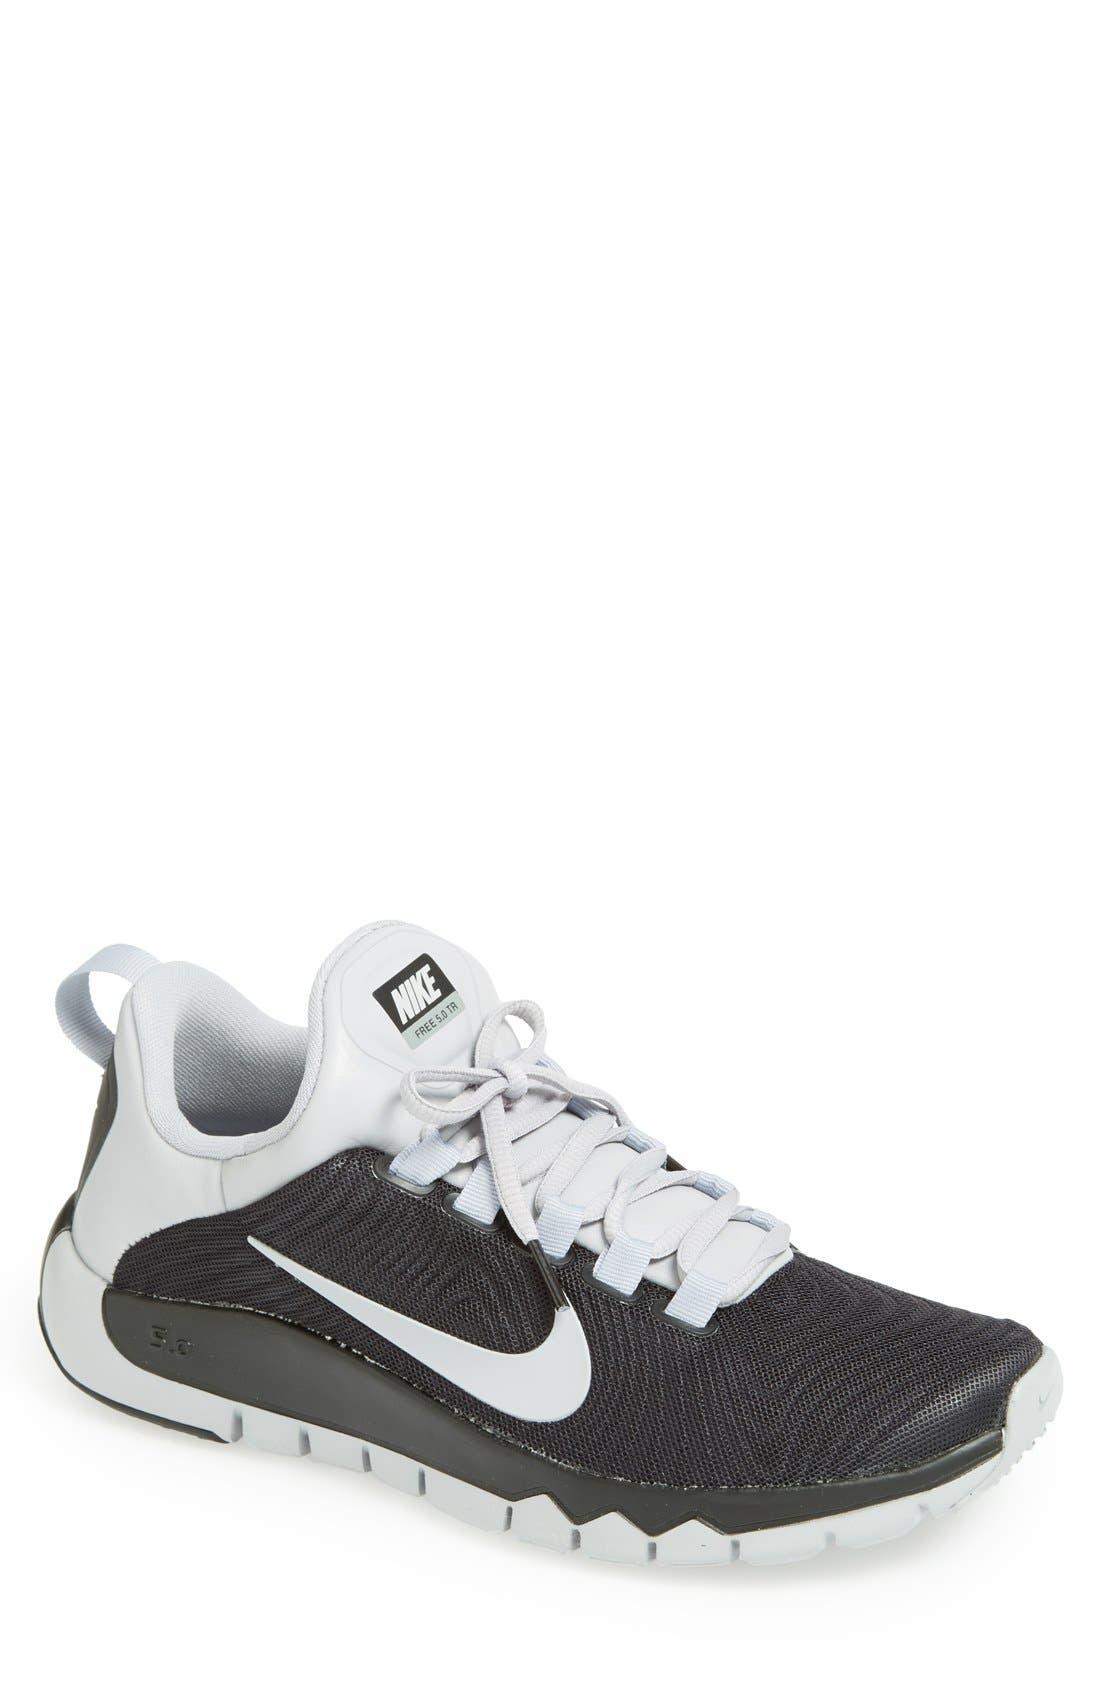 Alternate Image 1 Selected - Nike 'Free 5.0 Trainer' Training Shoe (Men)